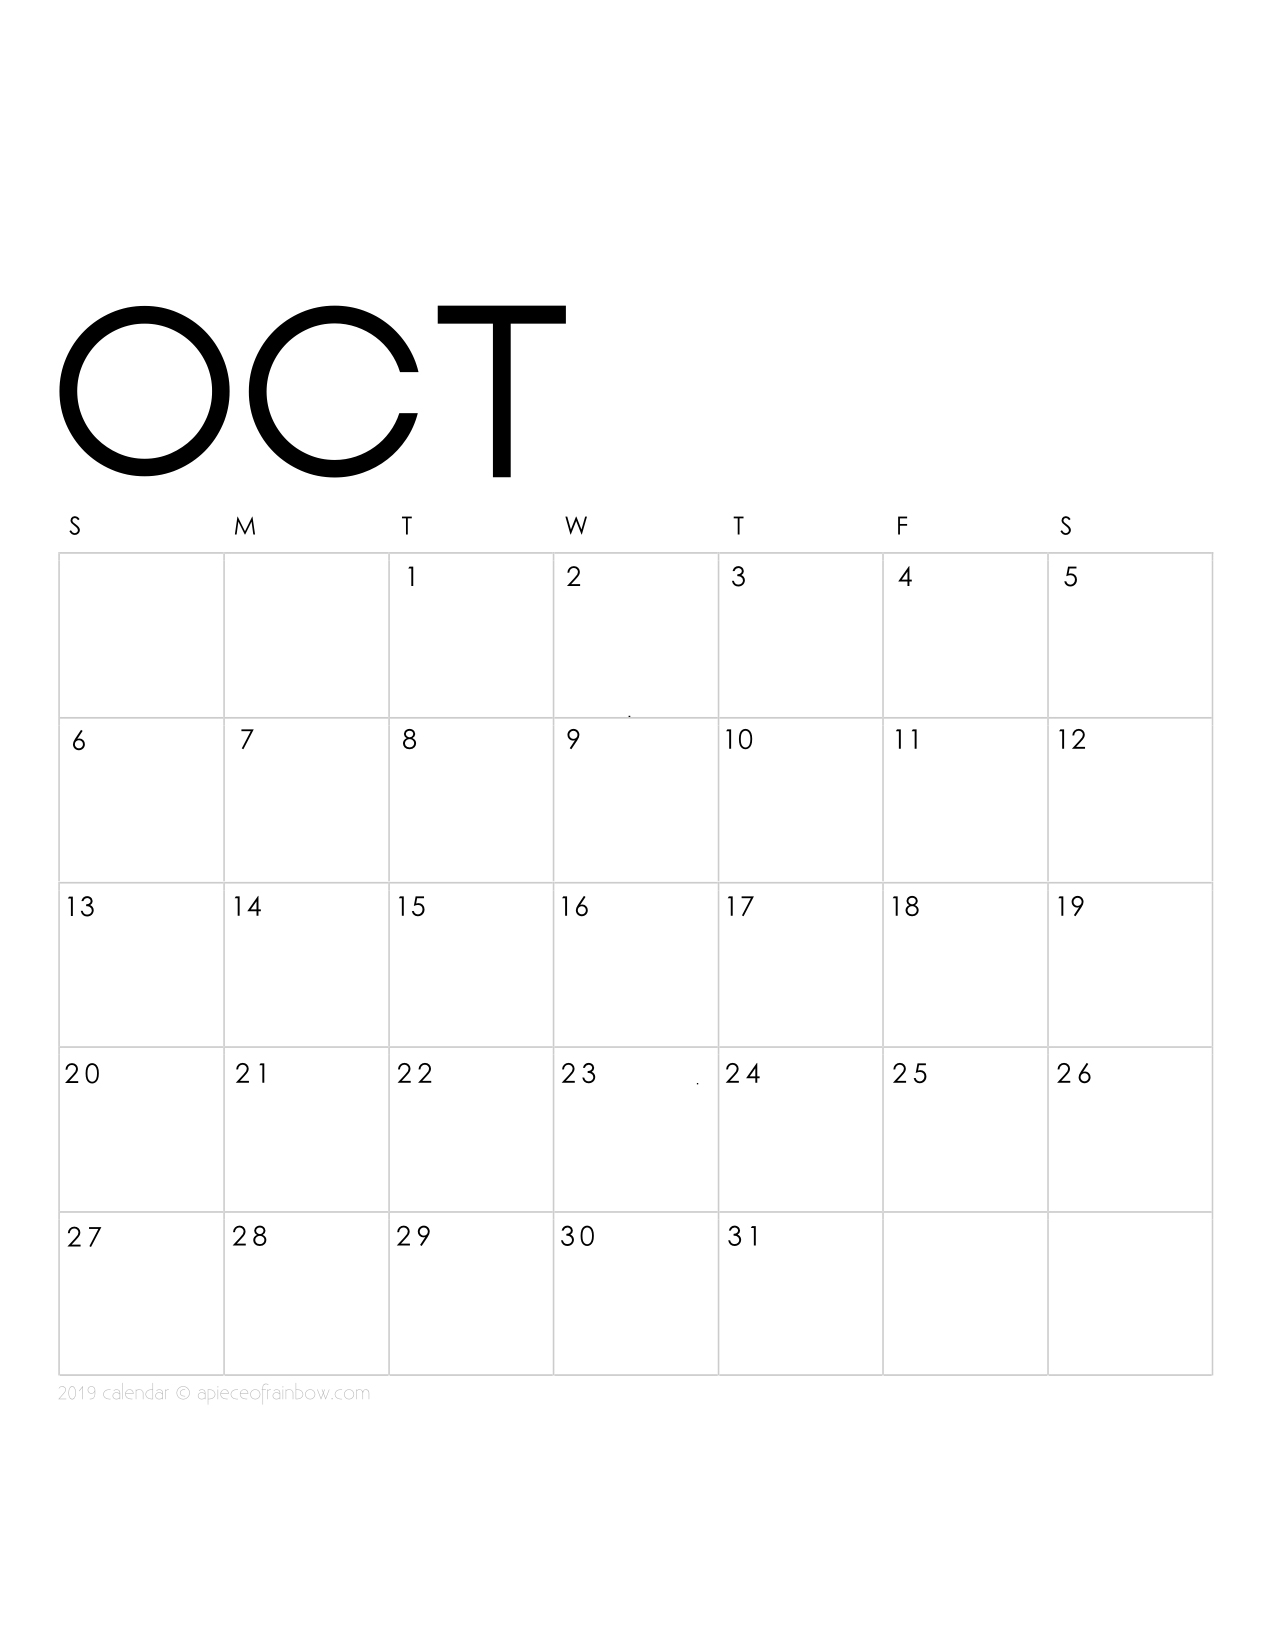 photo relating to Printable Oct Calendar identified as Printable Oct 2019 Calendar Every month Planner 2 Patterns